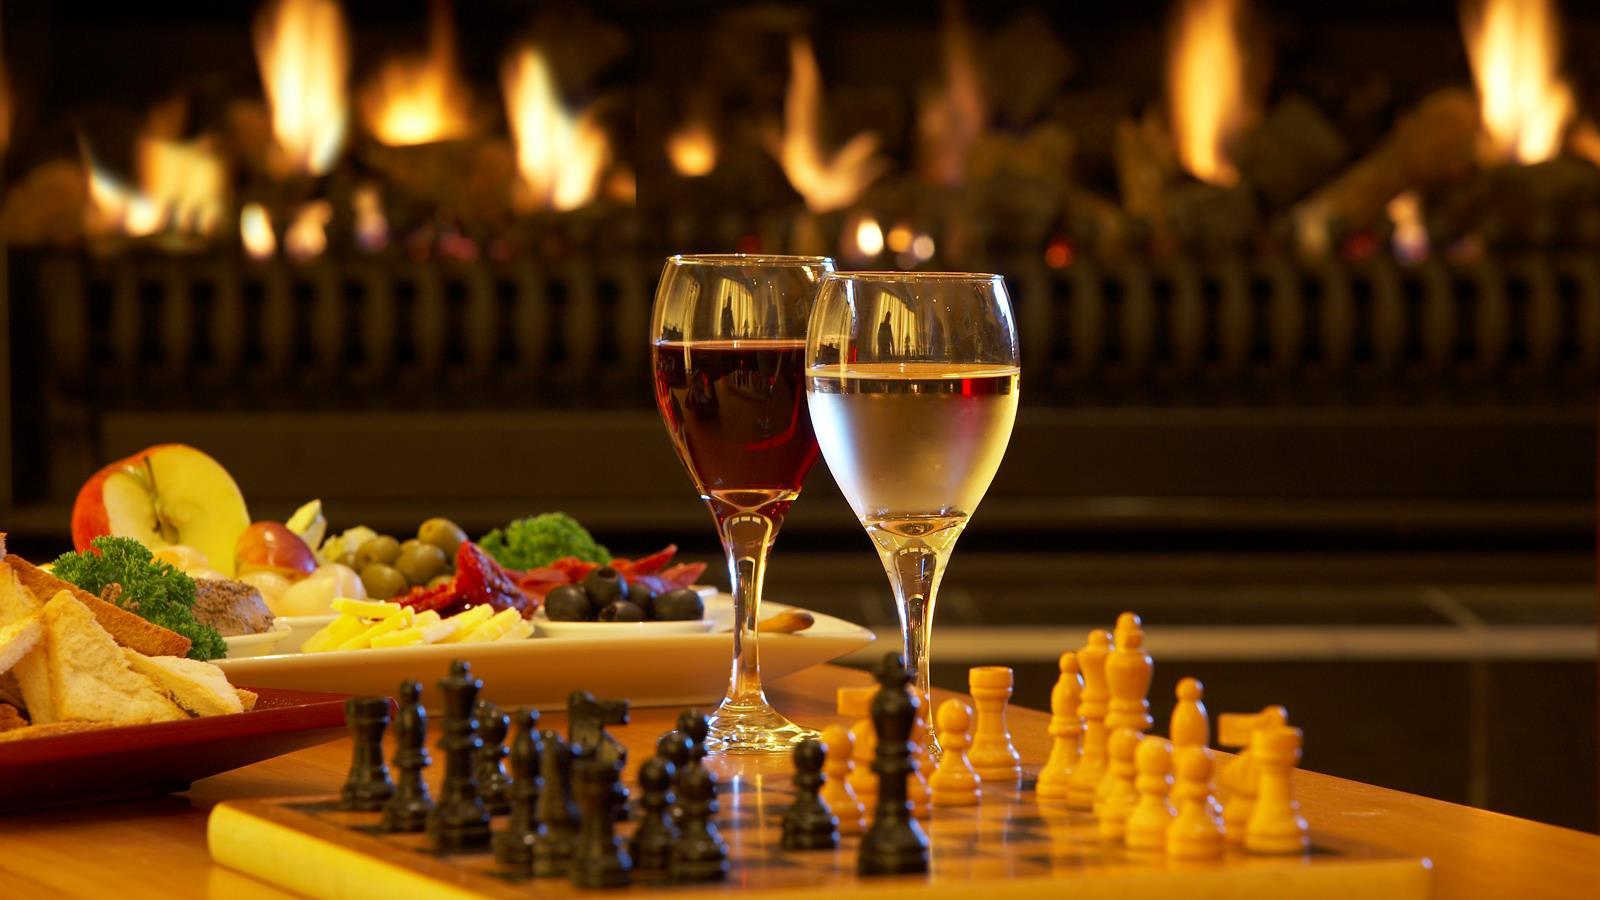 Chessboard_and_Wine.jpeg